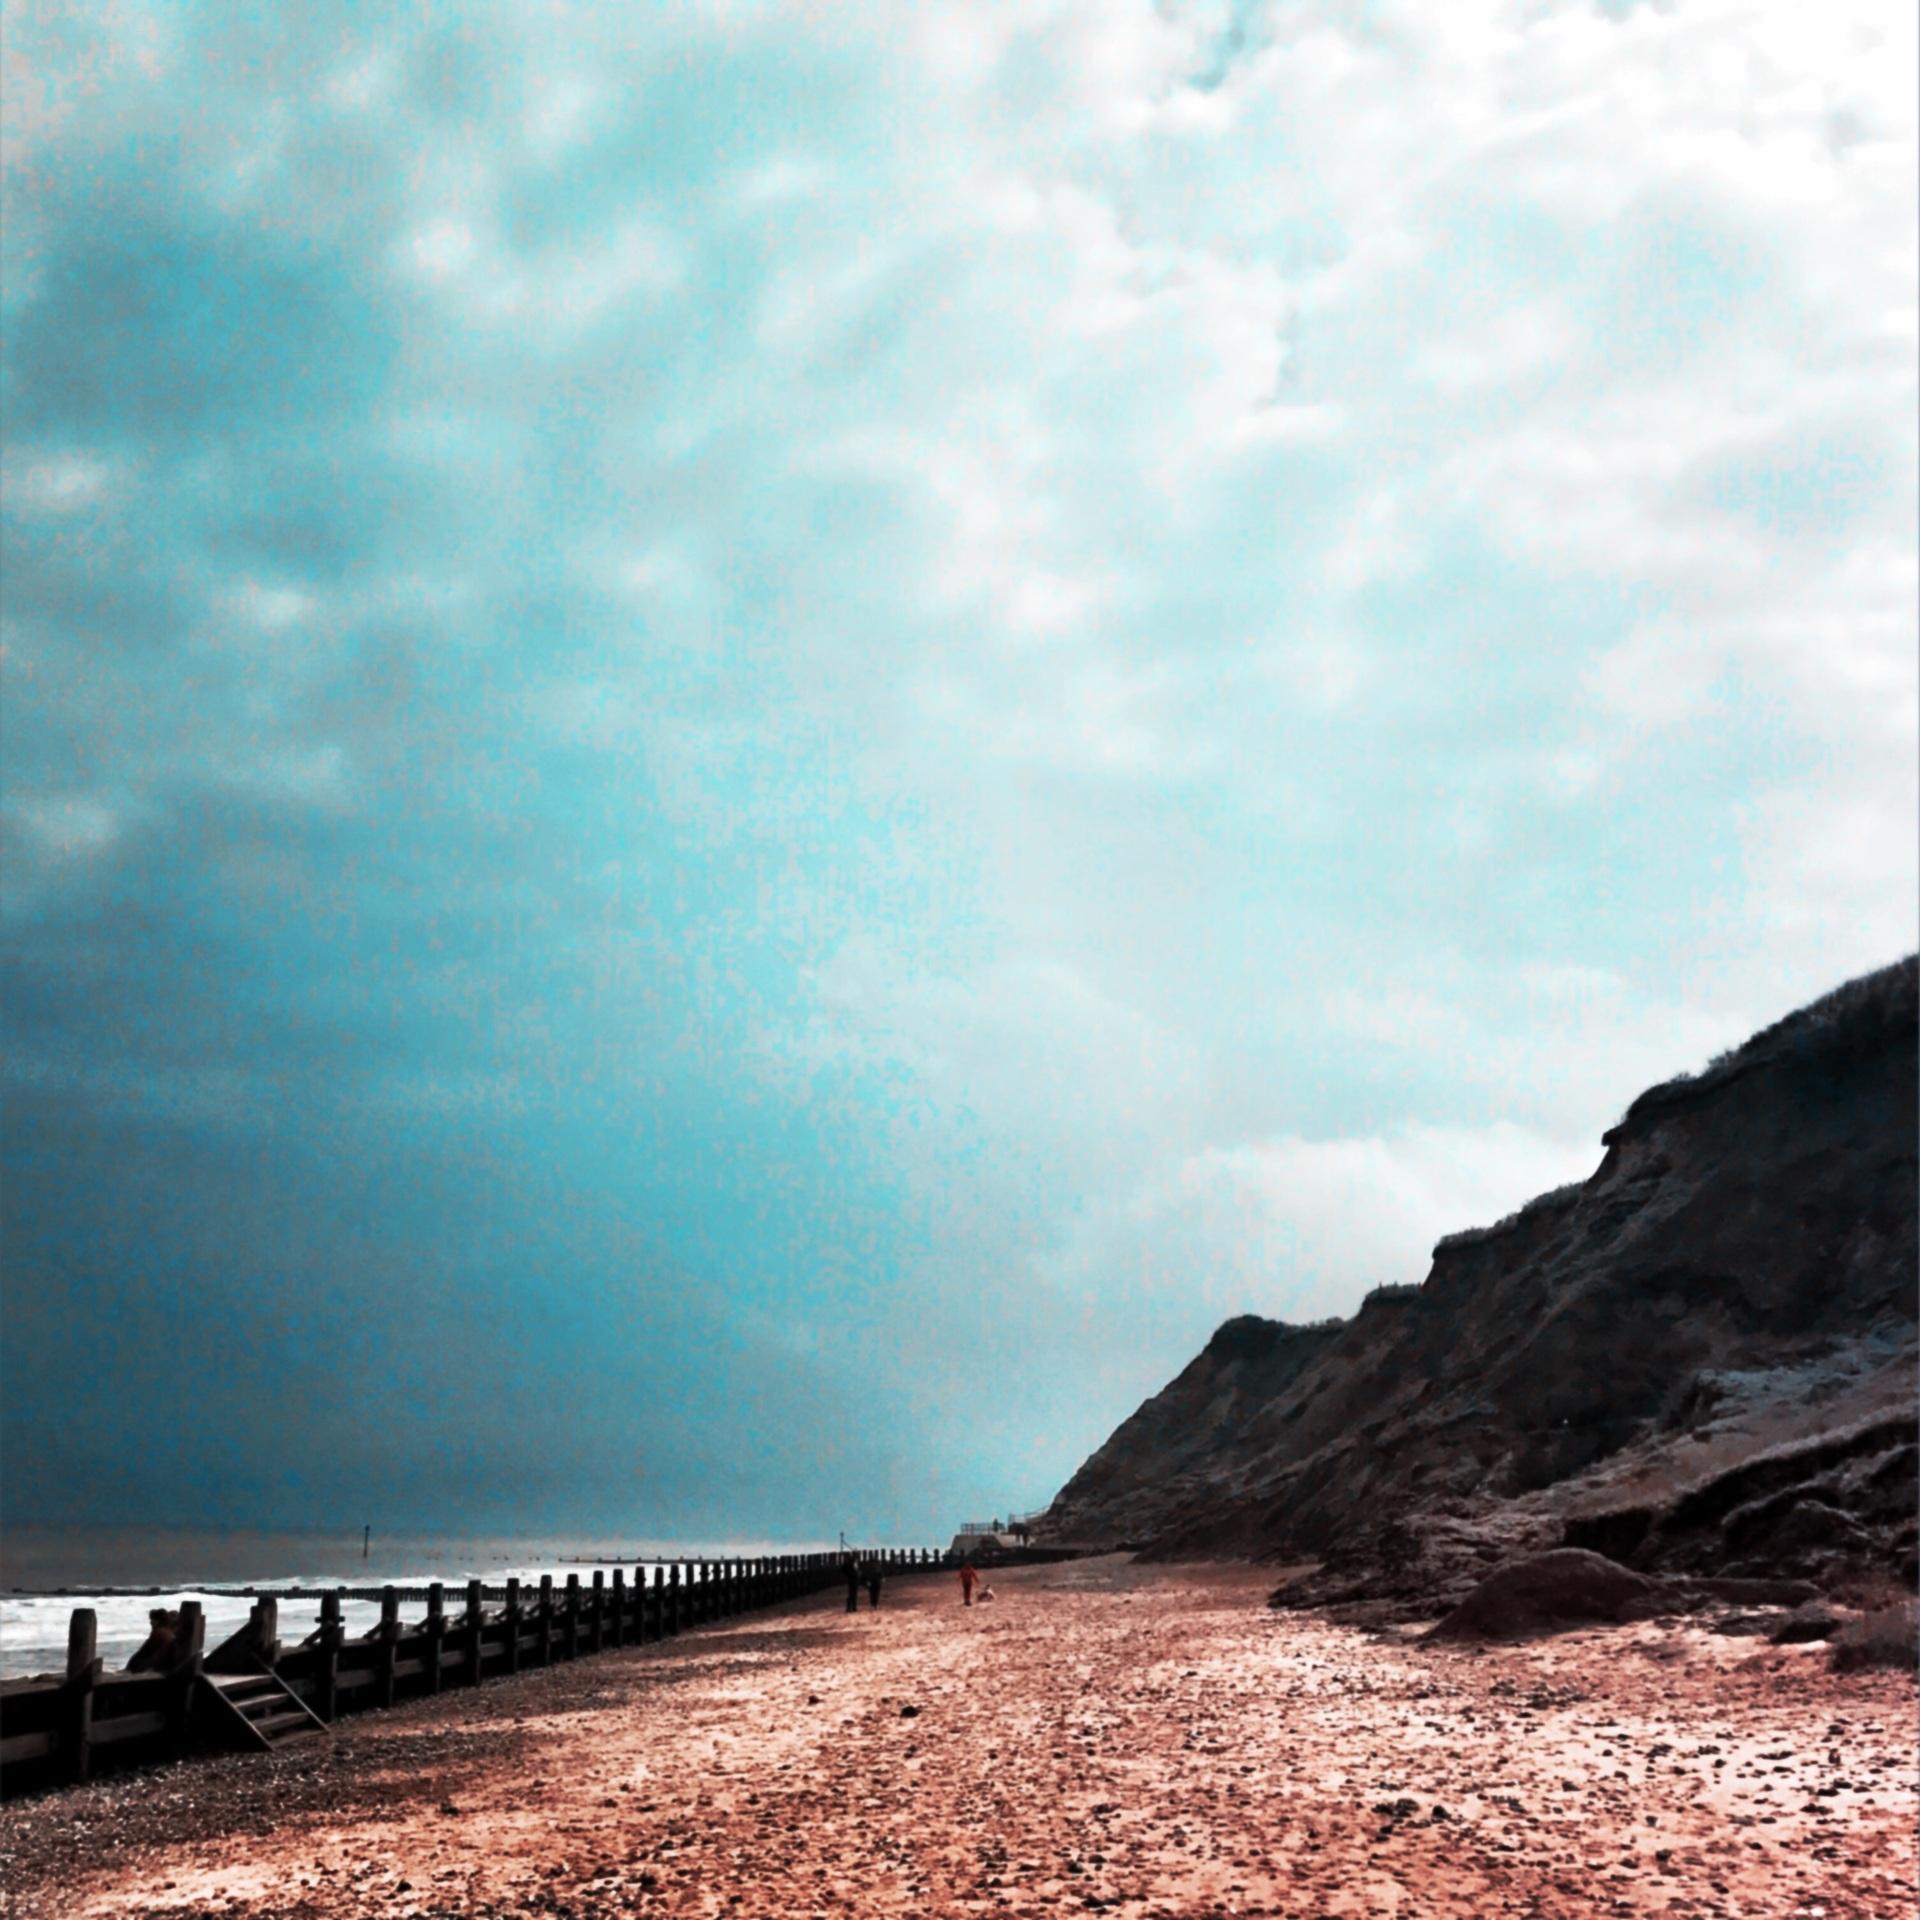 Abstract beach scenic    mezmic, travel, water, sea